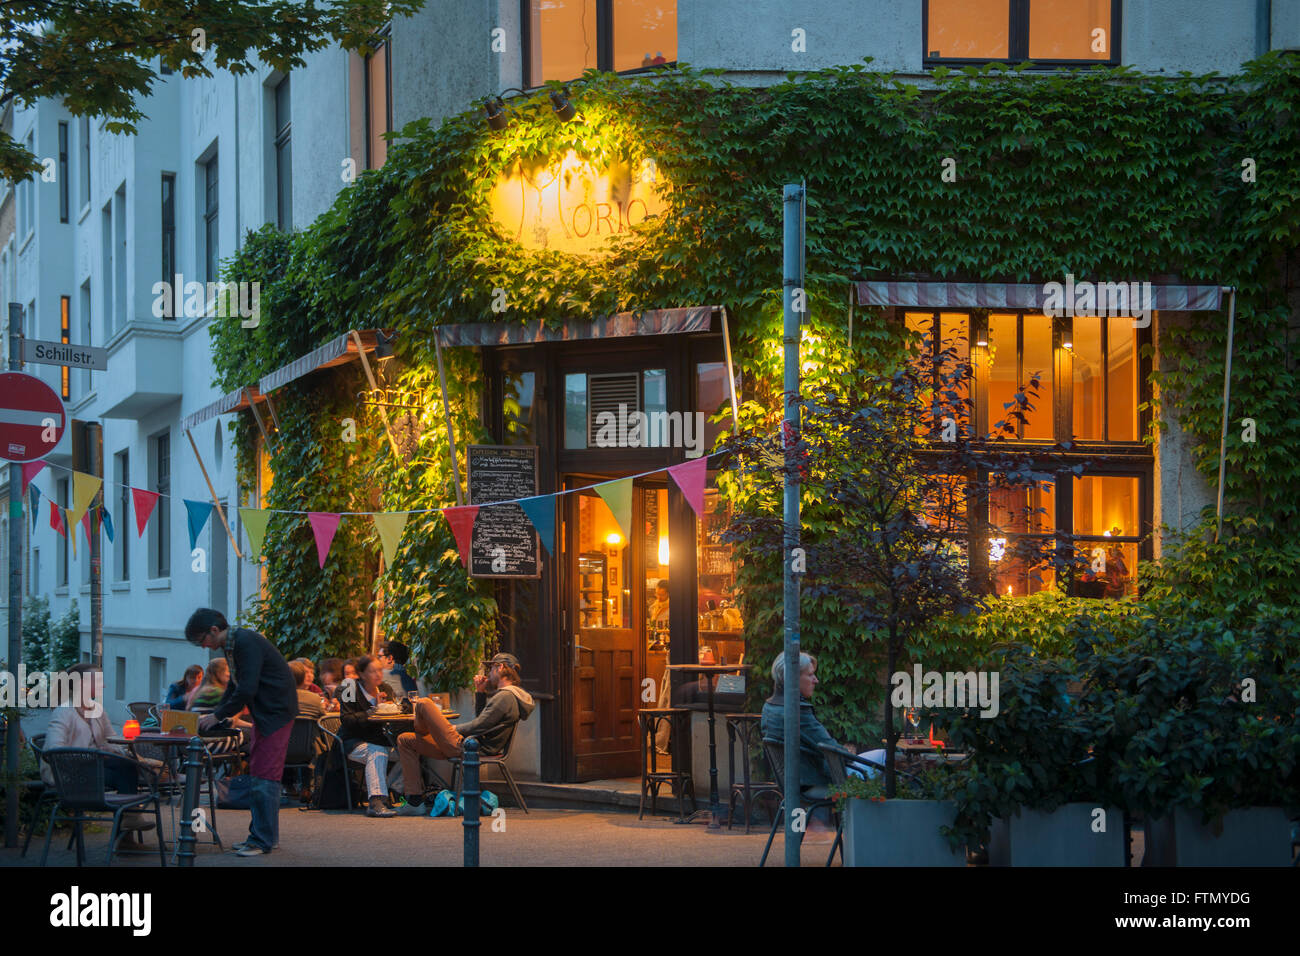 k ln nippes schillplatz weinstube morio stockfoto bild 101264172 alamy. Black Bedroom Furniture Sets. Home Design Ideas